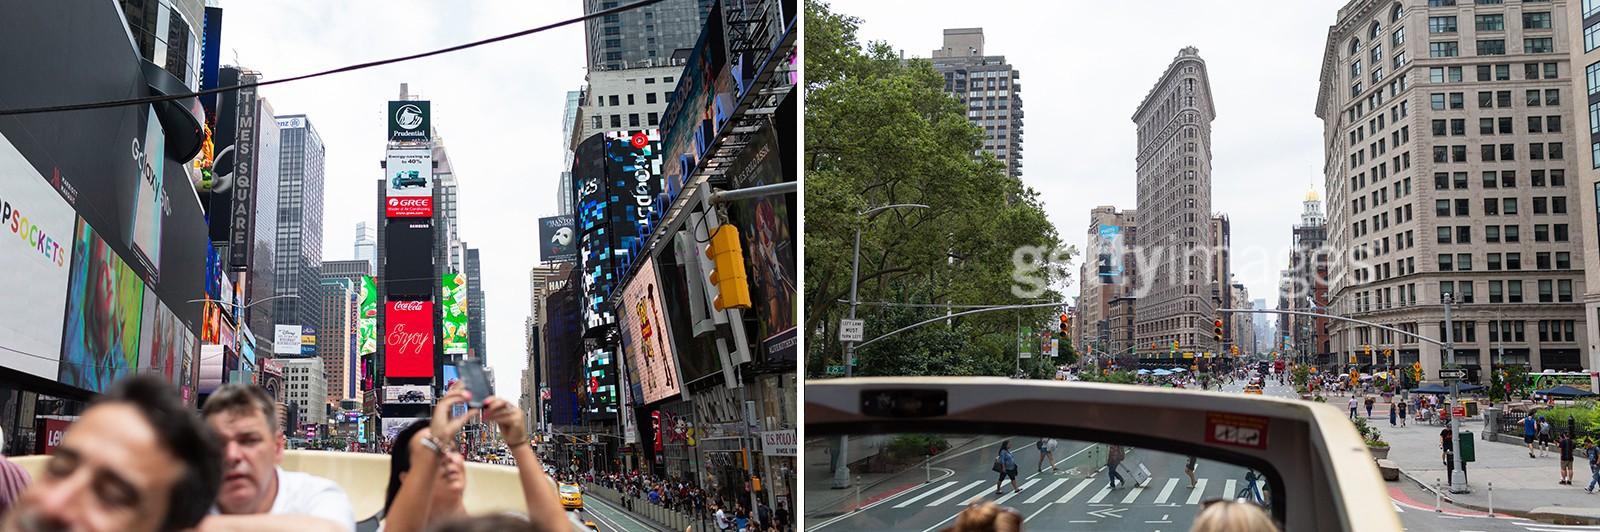 new york bus tour